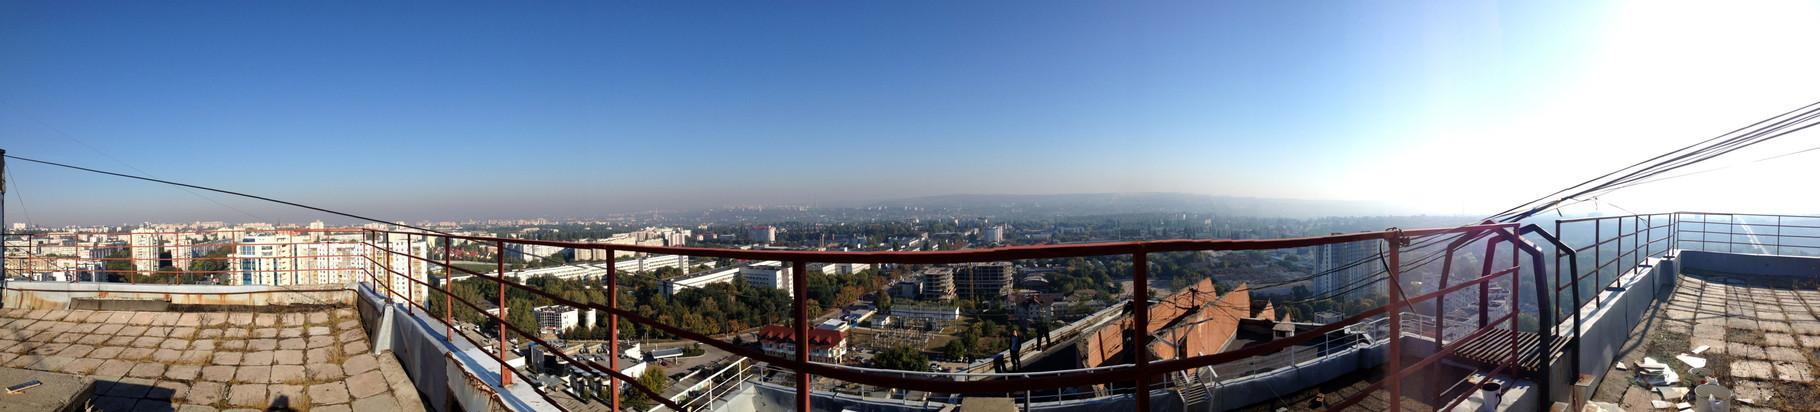 Chisinau - terrace view